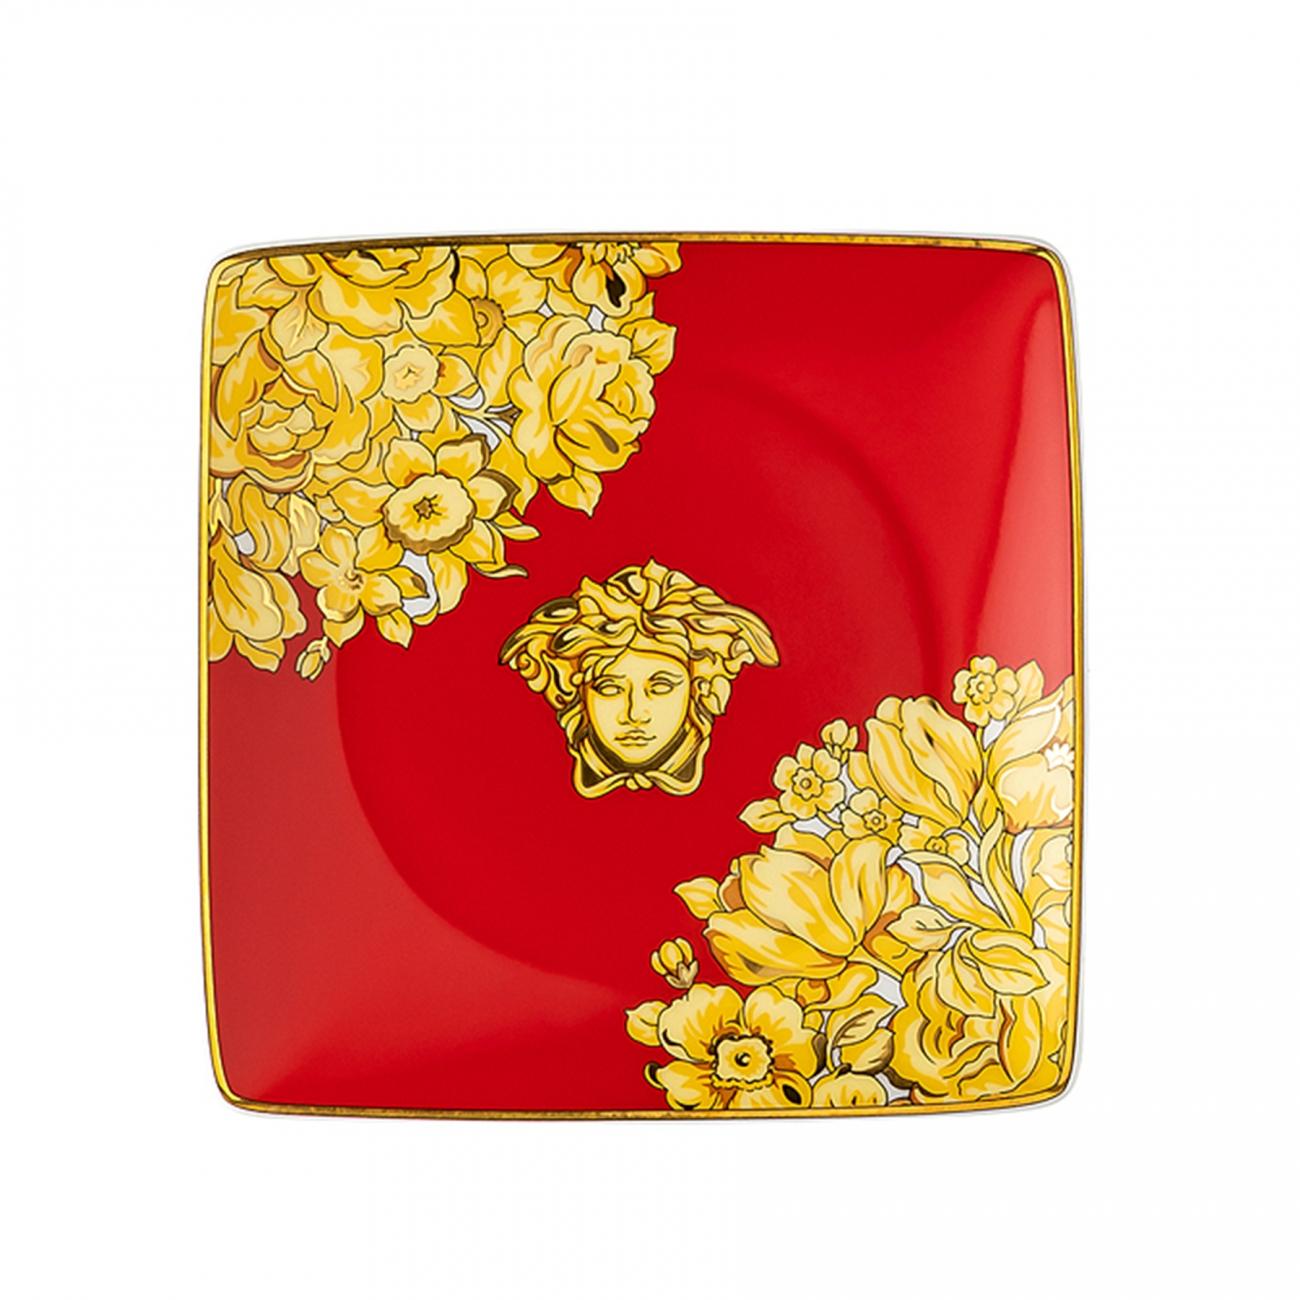 Rosenthal Versace Medusa Rhapsody Red Bowl square flat